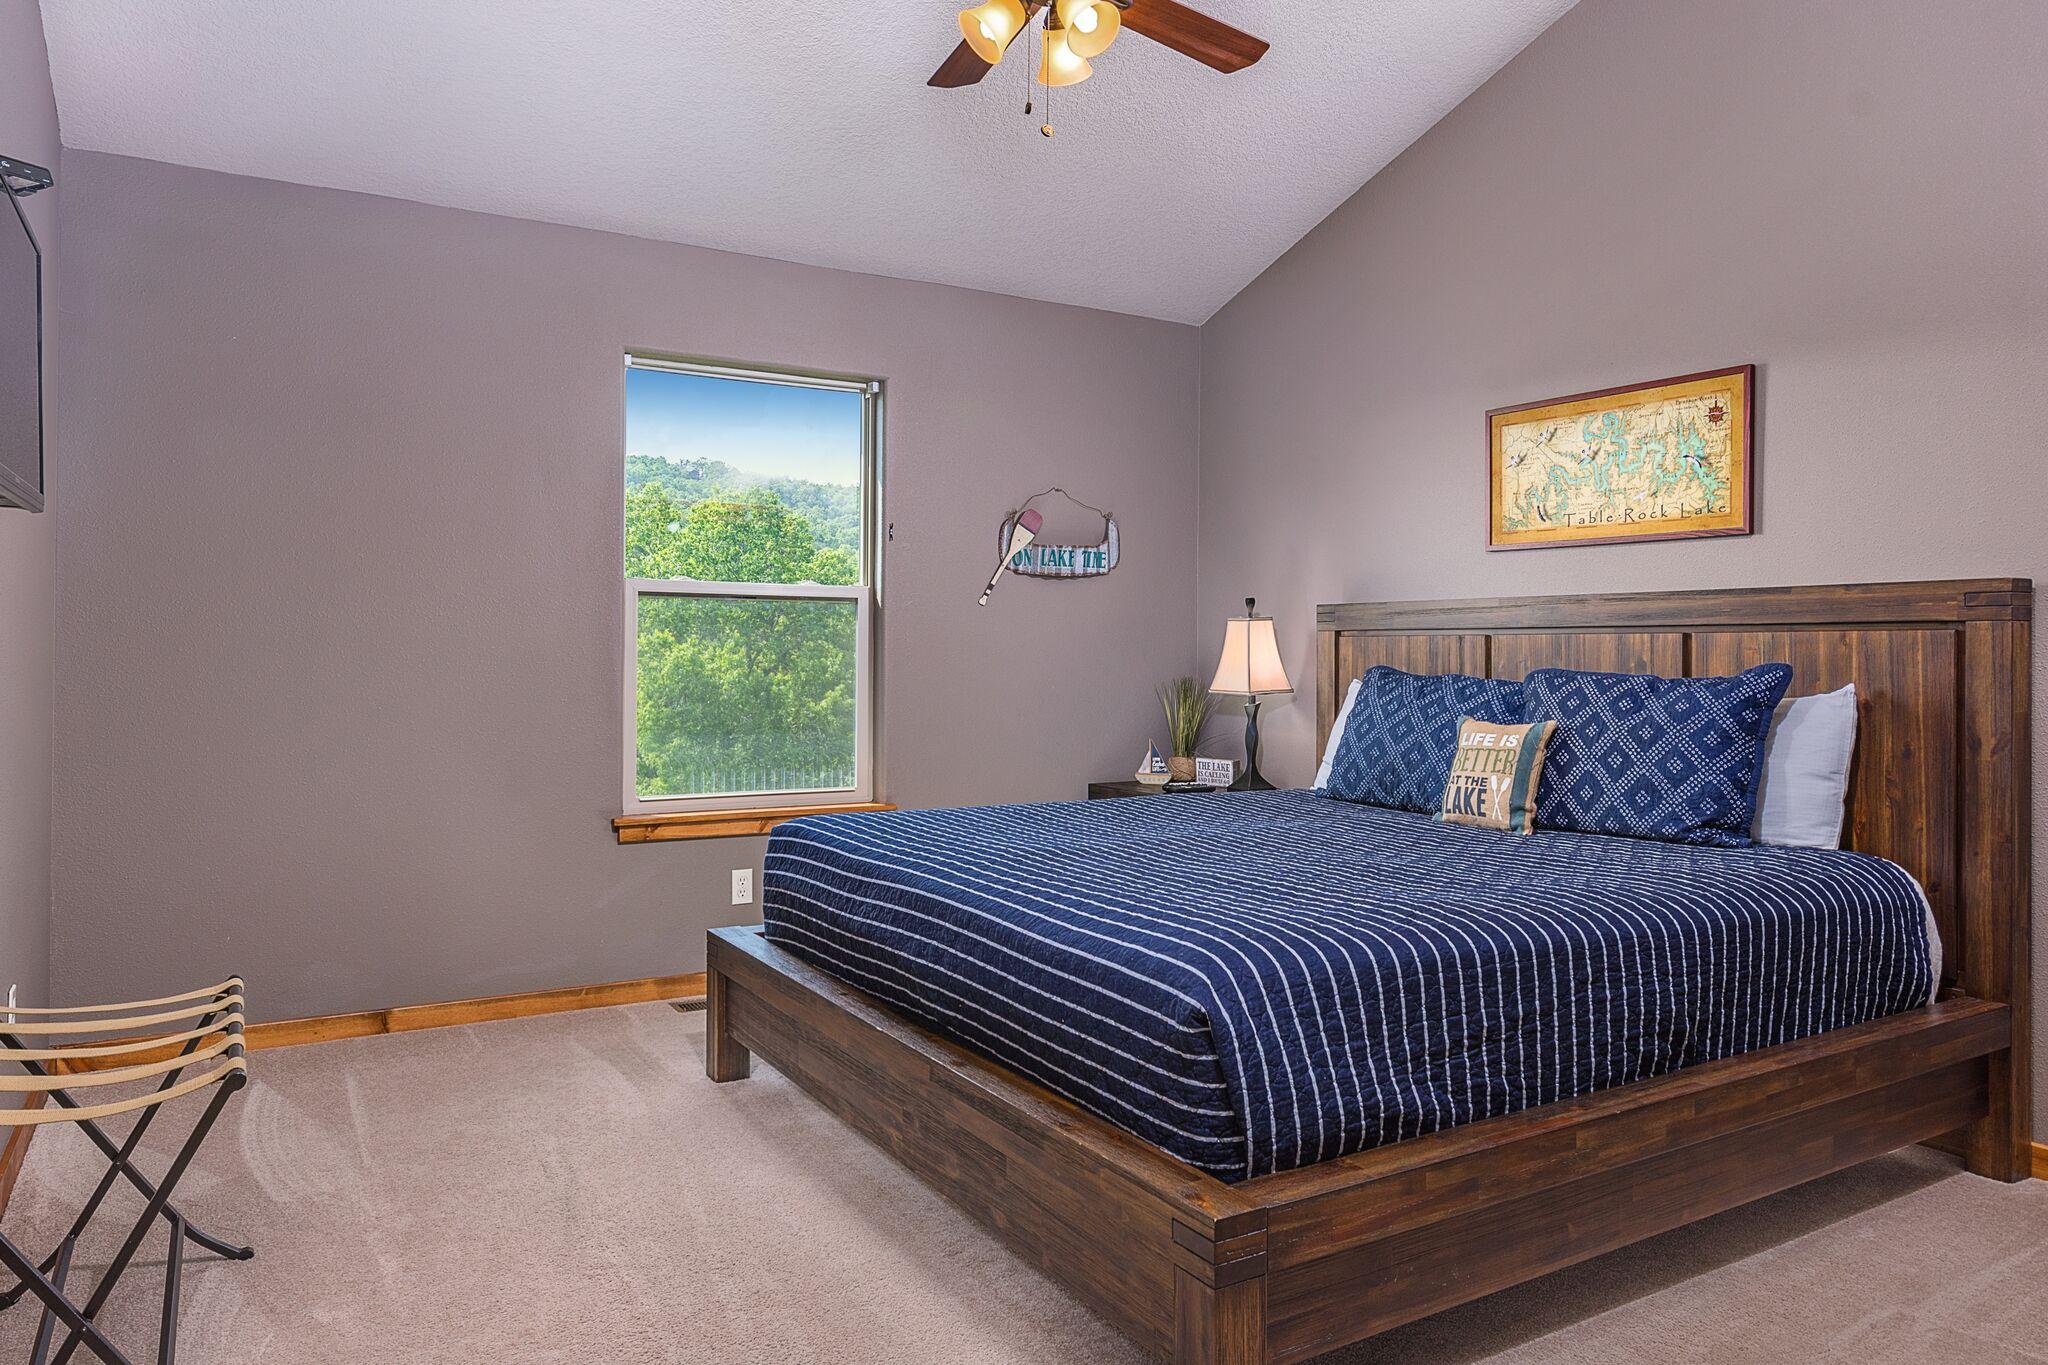 Interior_Bedroom_06